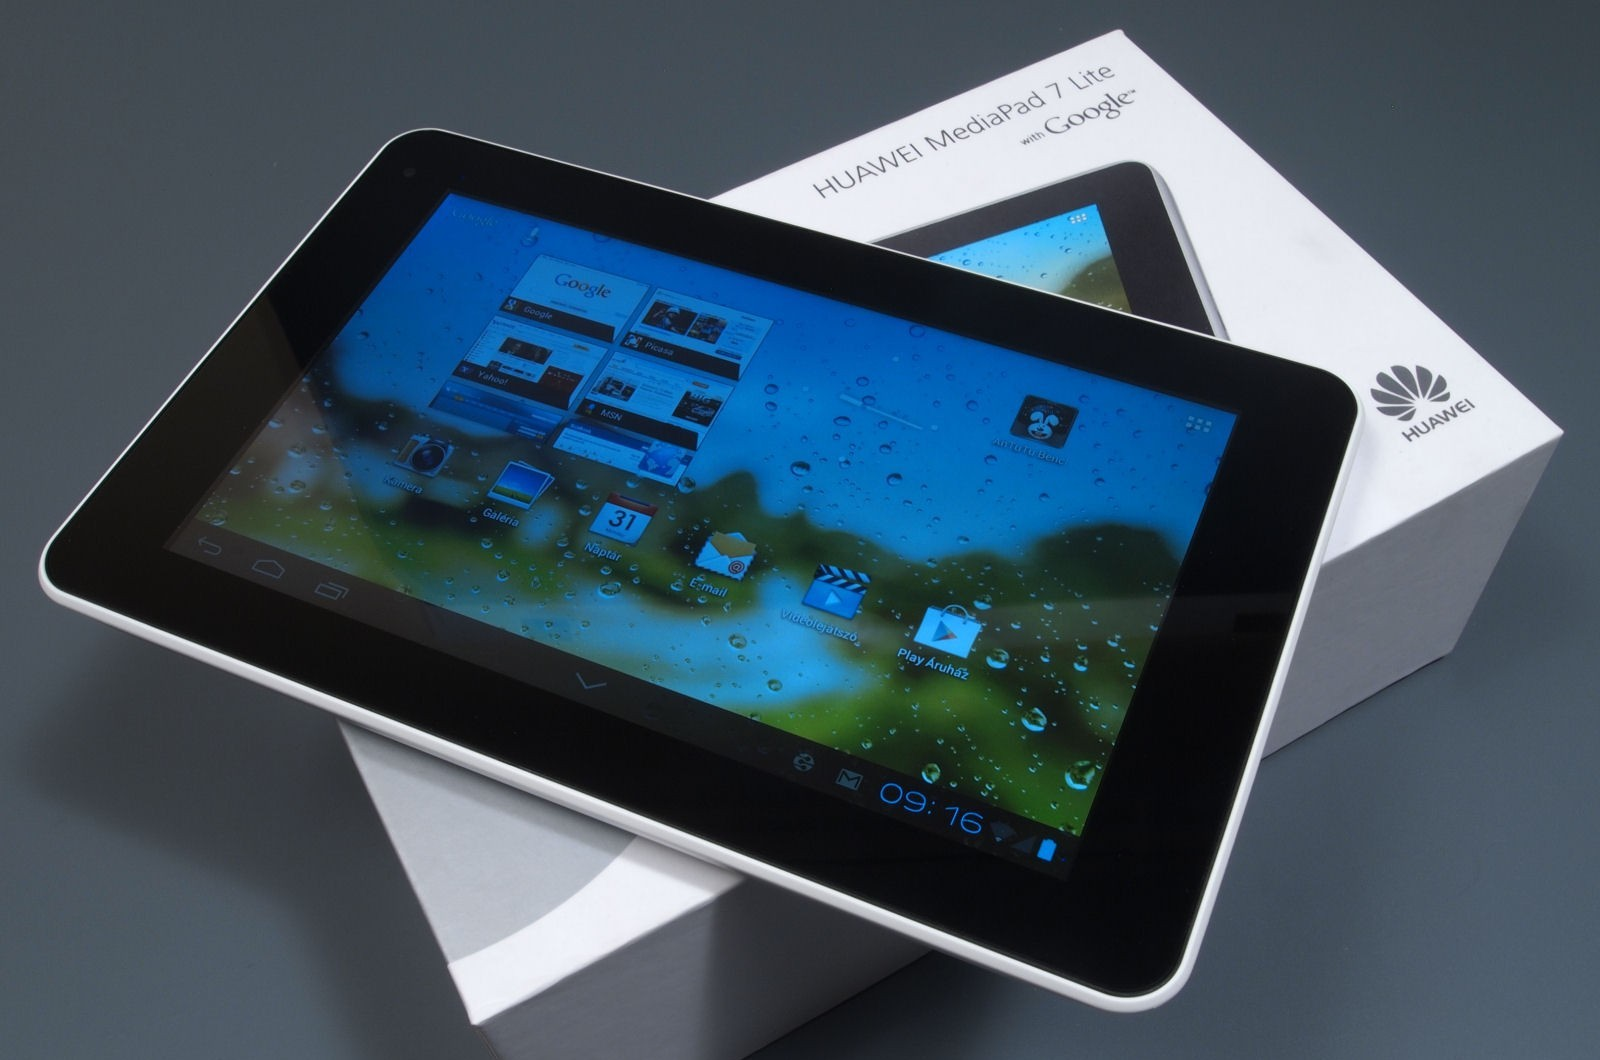 Обзор Huawei MediaPad 7 Lite